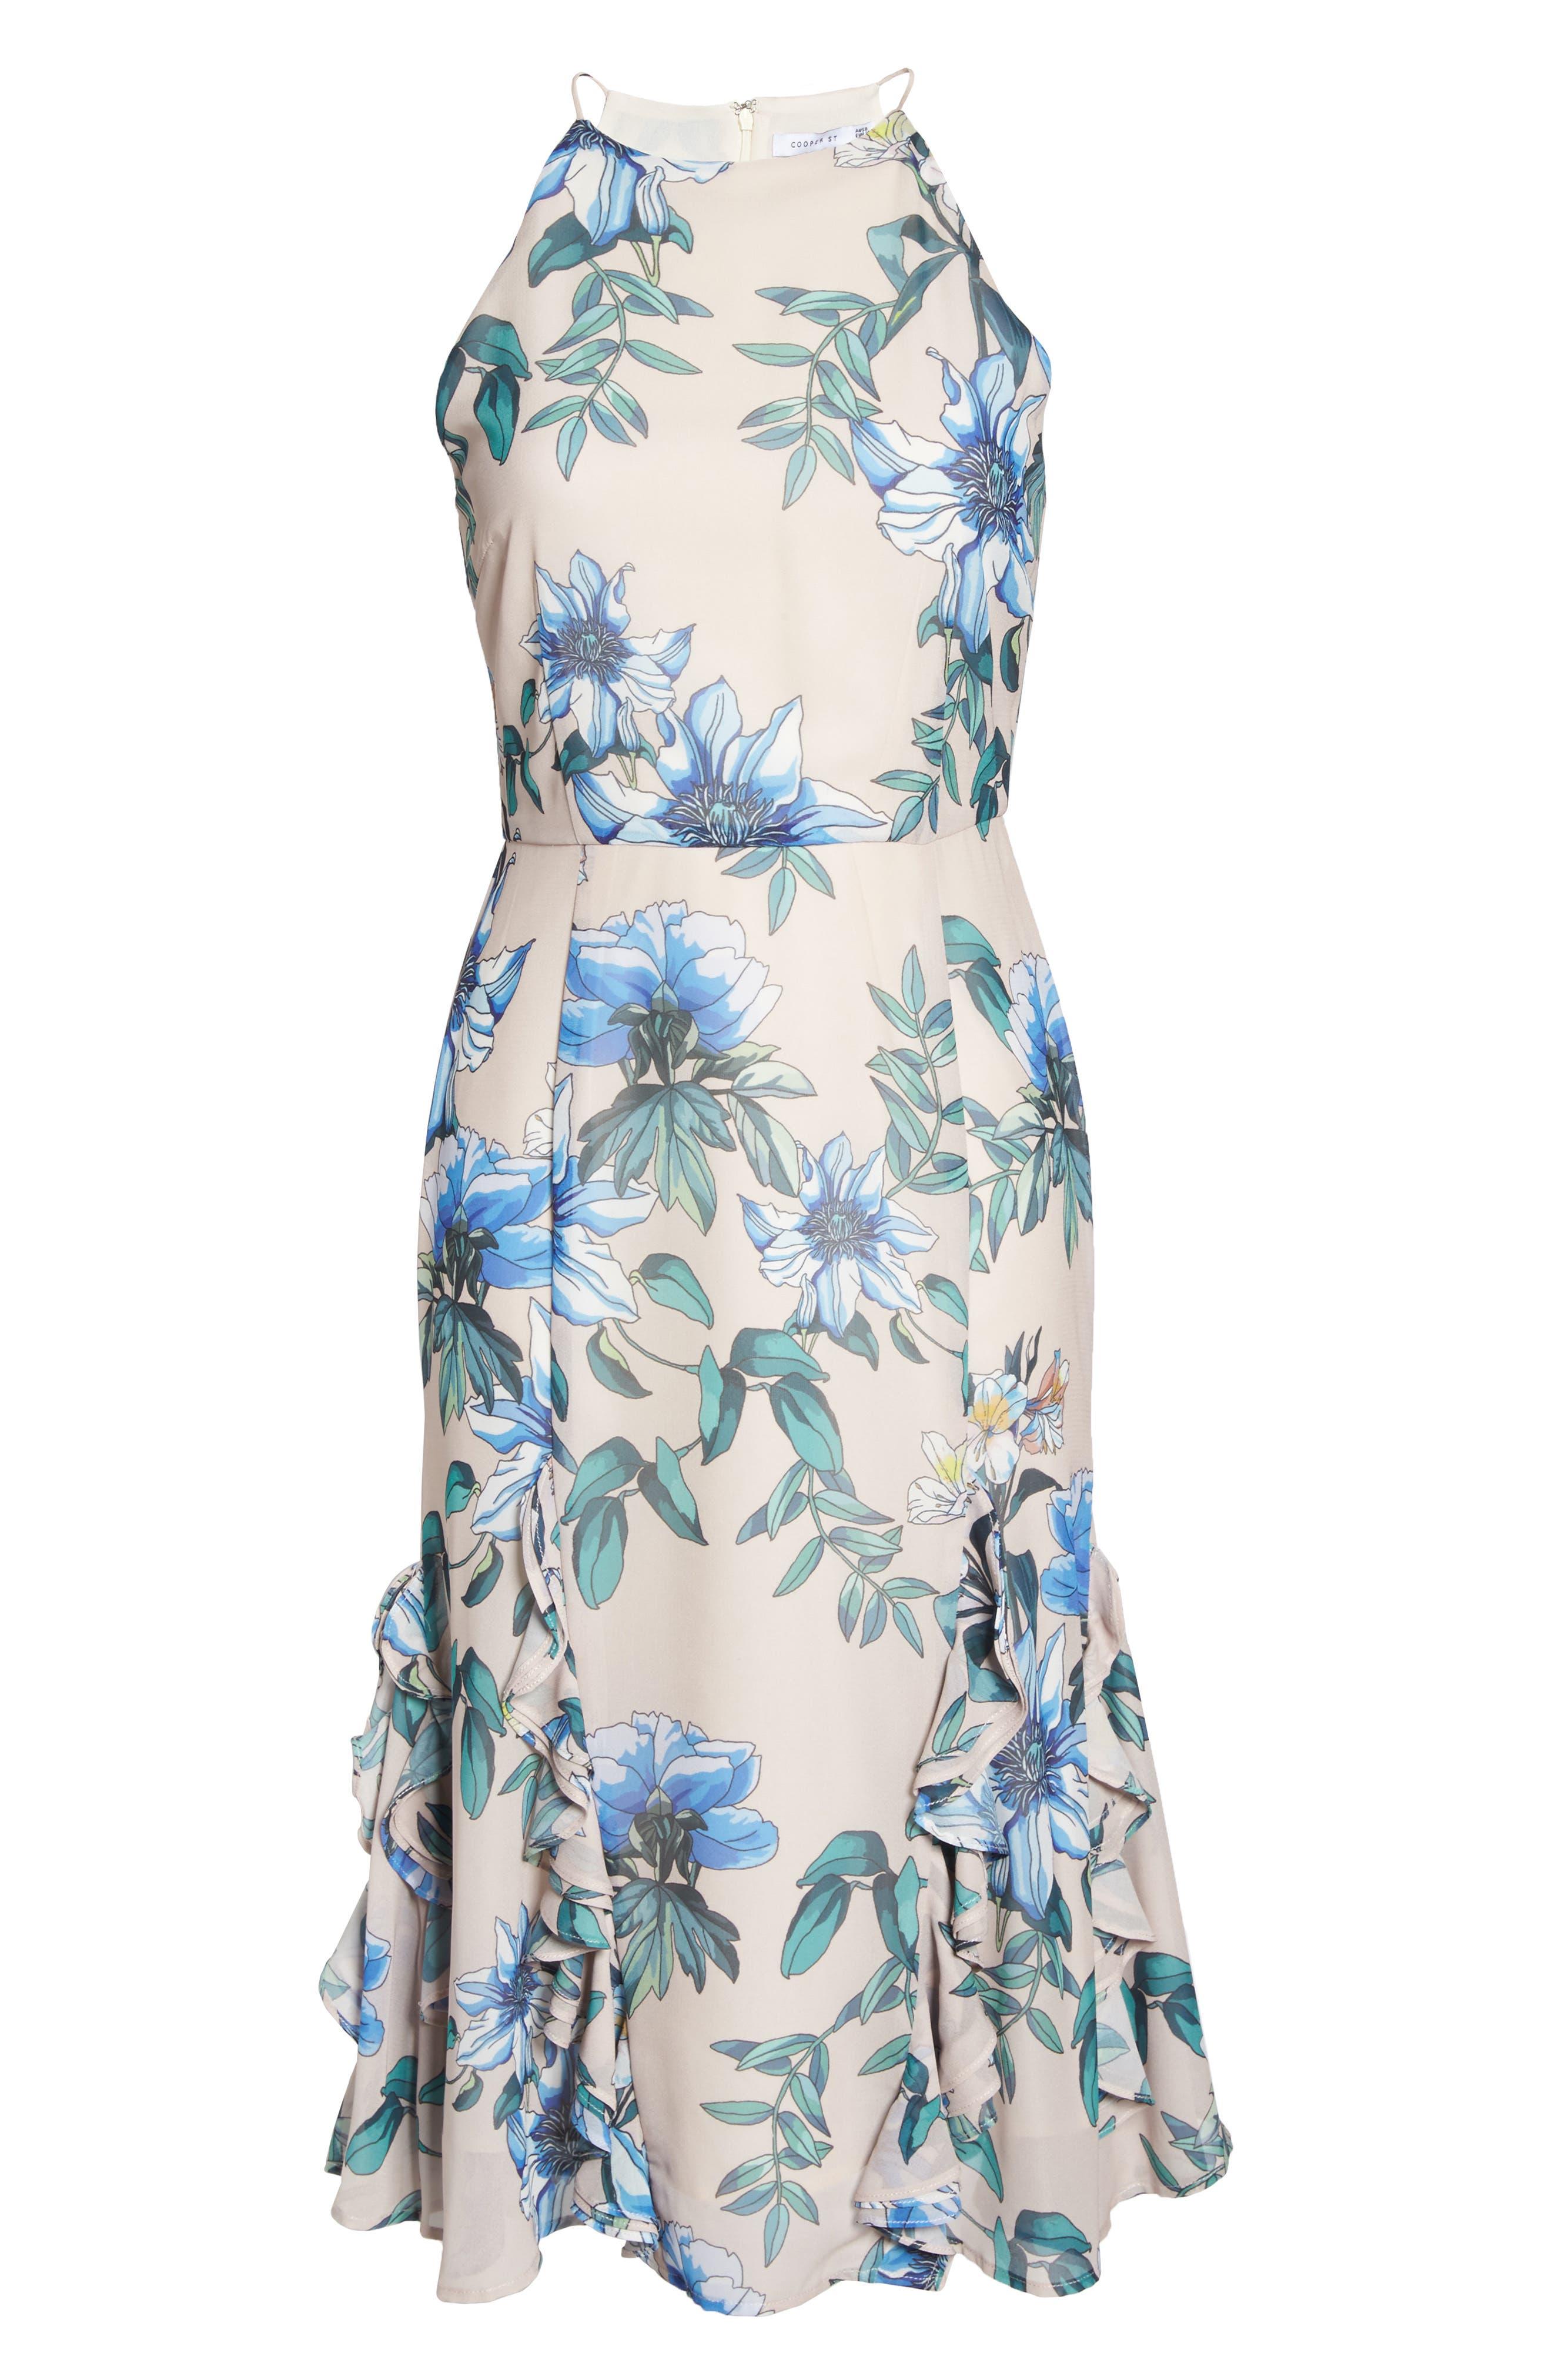 Floral Courtyard Midi Dress,                             Alternate thumbnail 6, color,                             Print Light